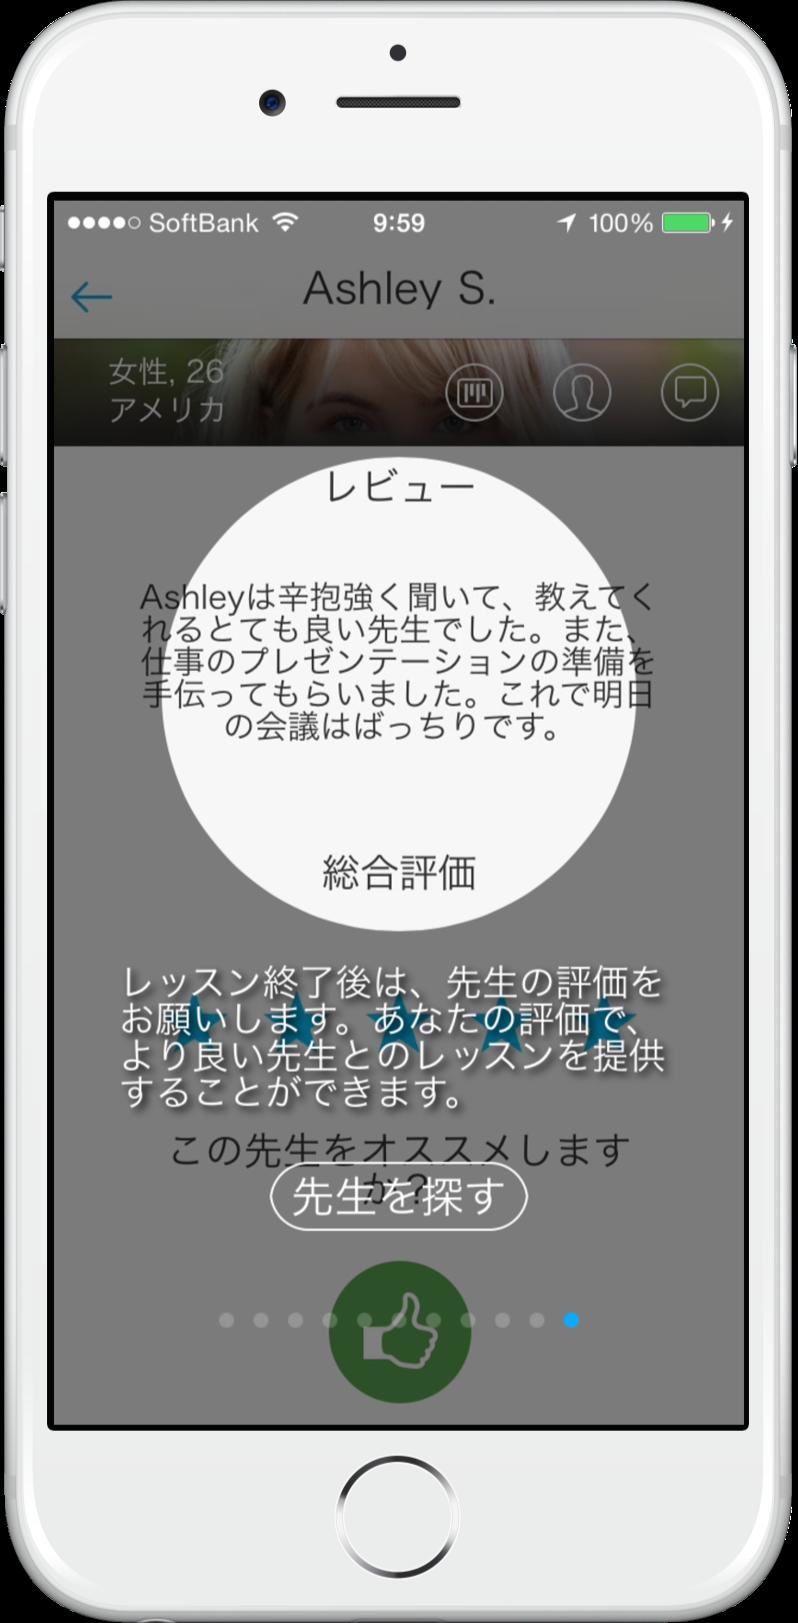 eikaiwaNOW - レッスンの流れ - JPN - 10_iphone6_silver_portrait.png